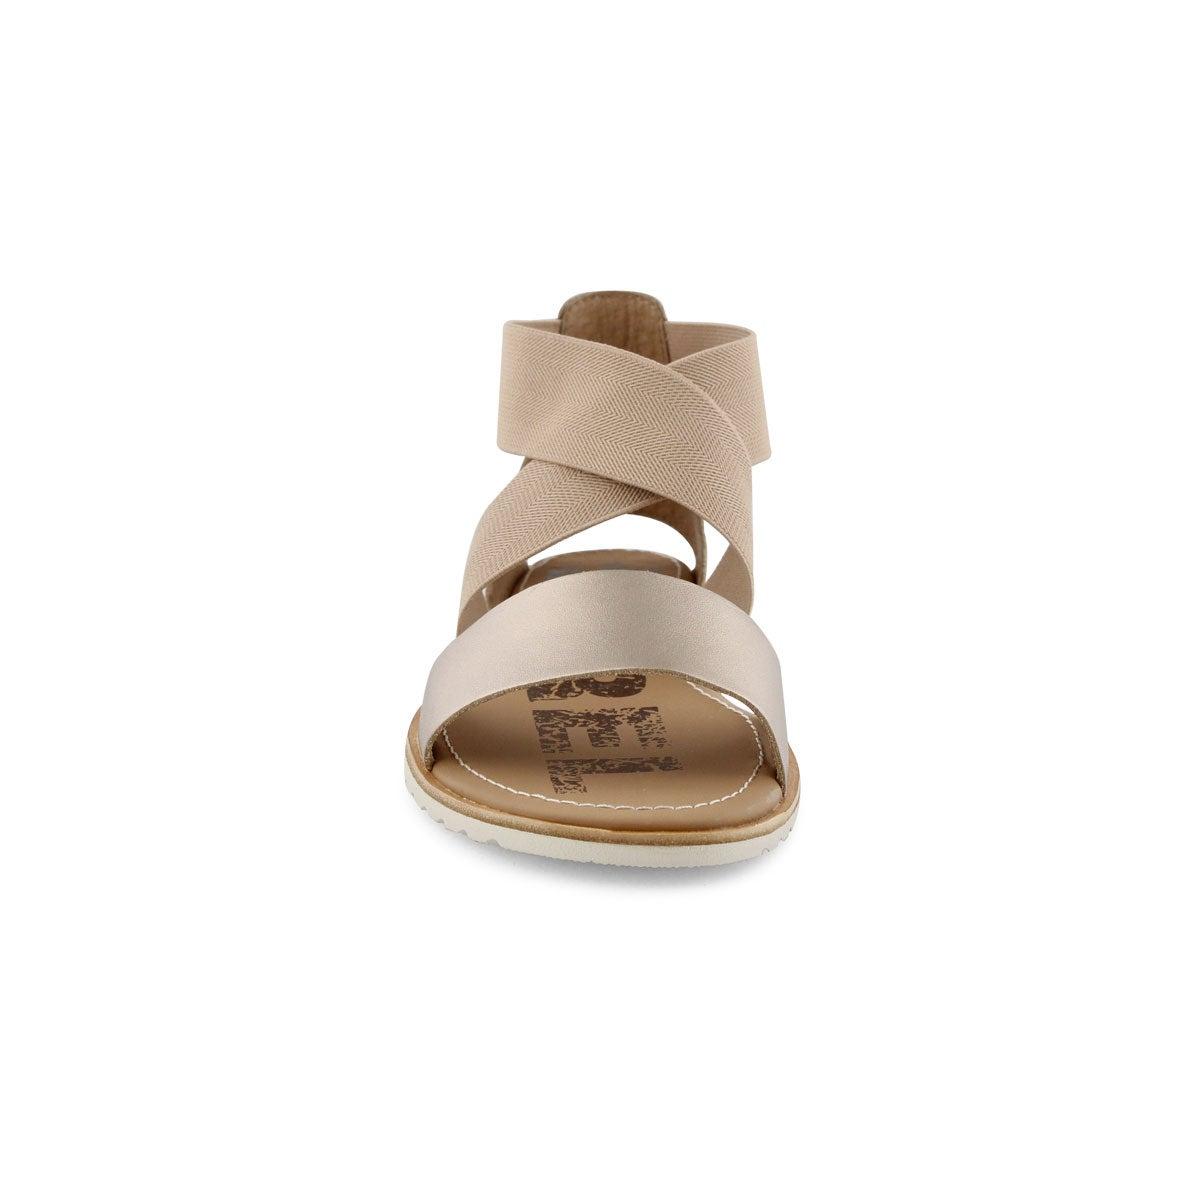 Lds Ella warm gold casual sandal